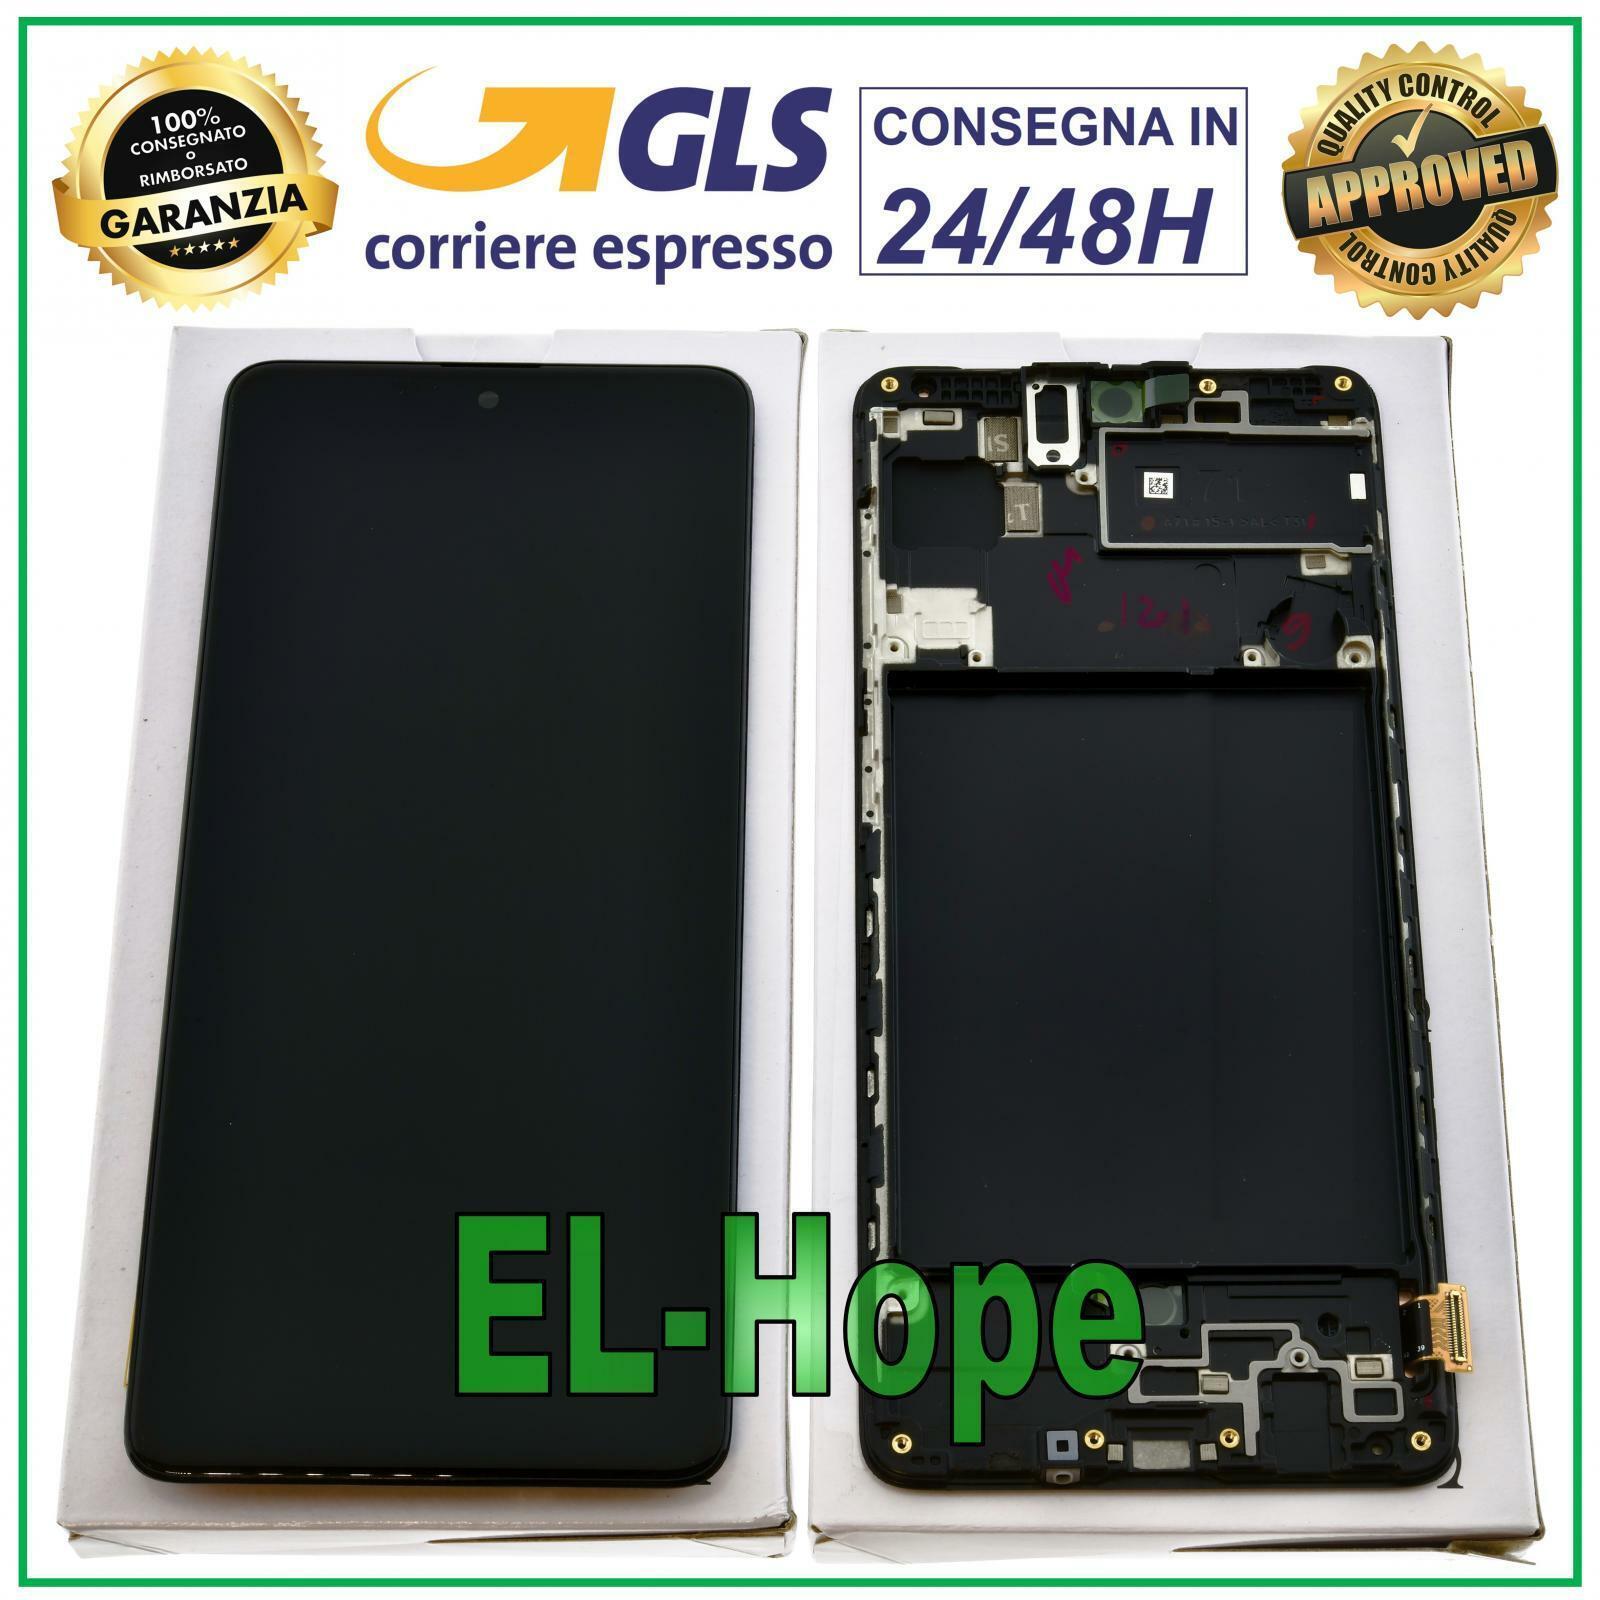 Samsung Galaxy: DISPLAY LCD + FRAME ORIGINALE SAMSUNG GALAXY A71 SM-A715F TOUCH SCREEN 6.7″ NERO